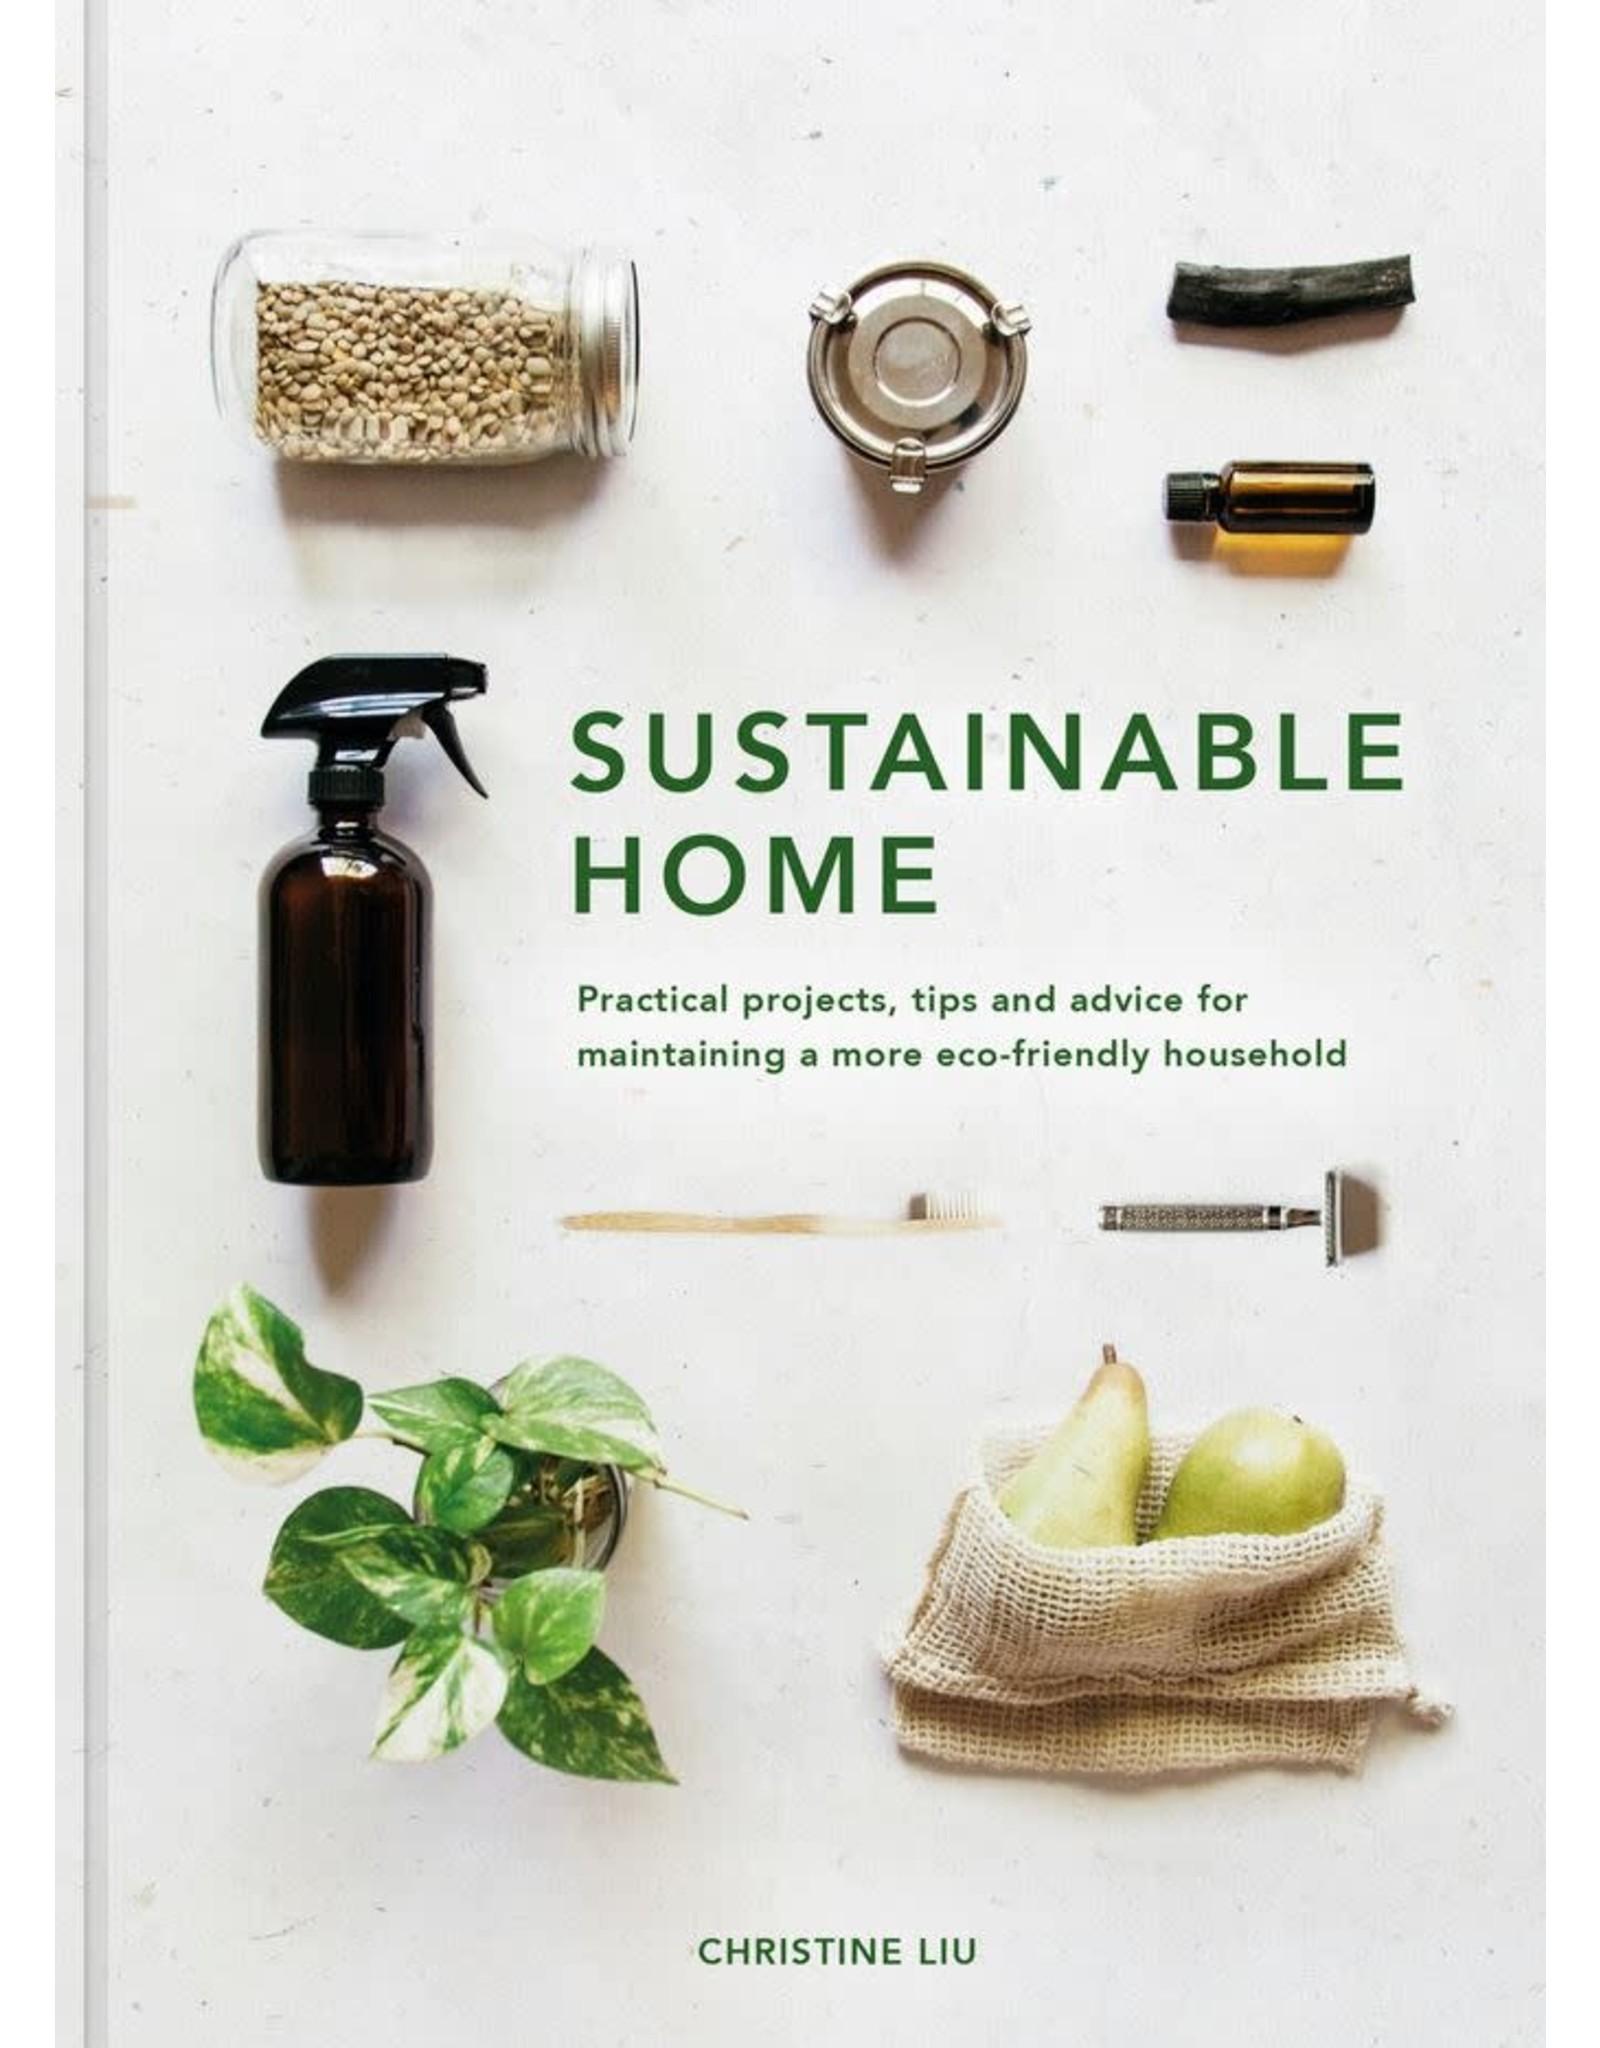 Sustainable Home by Christine Liu